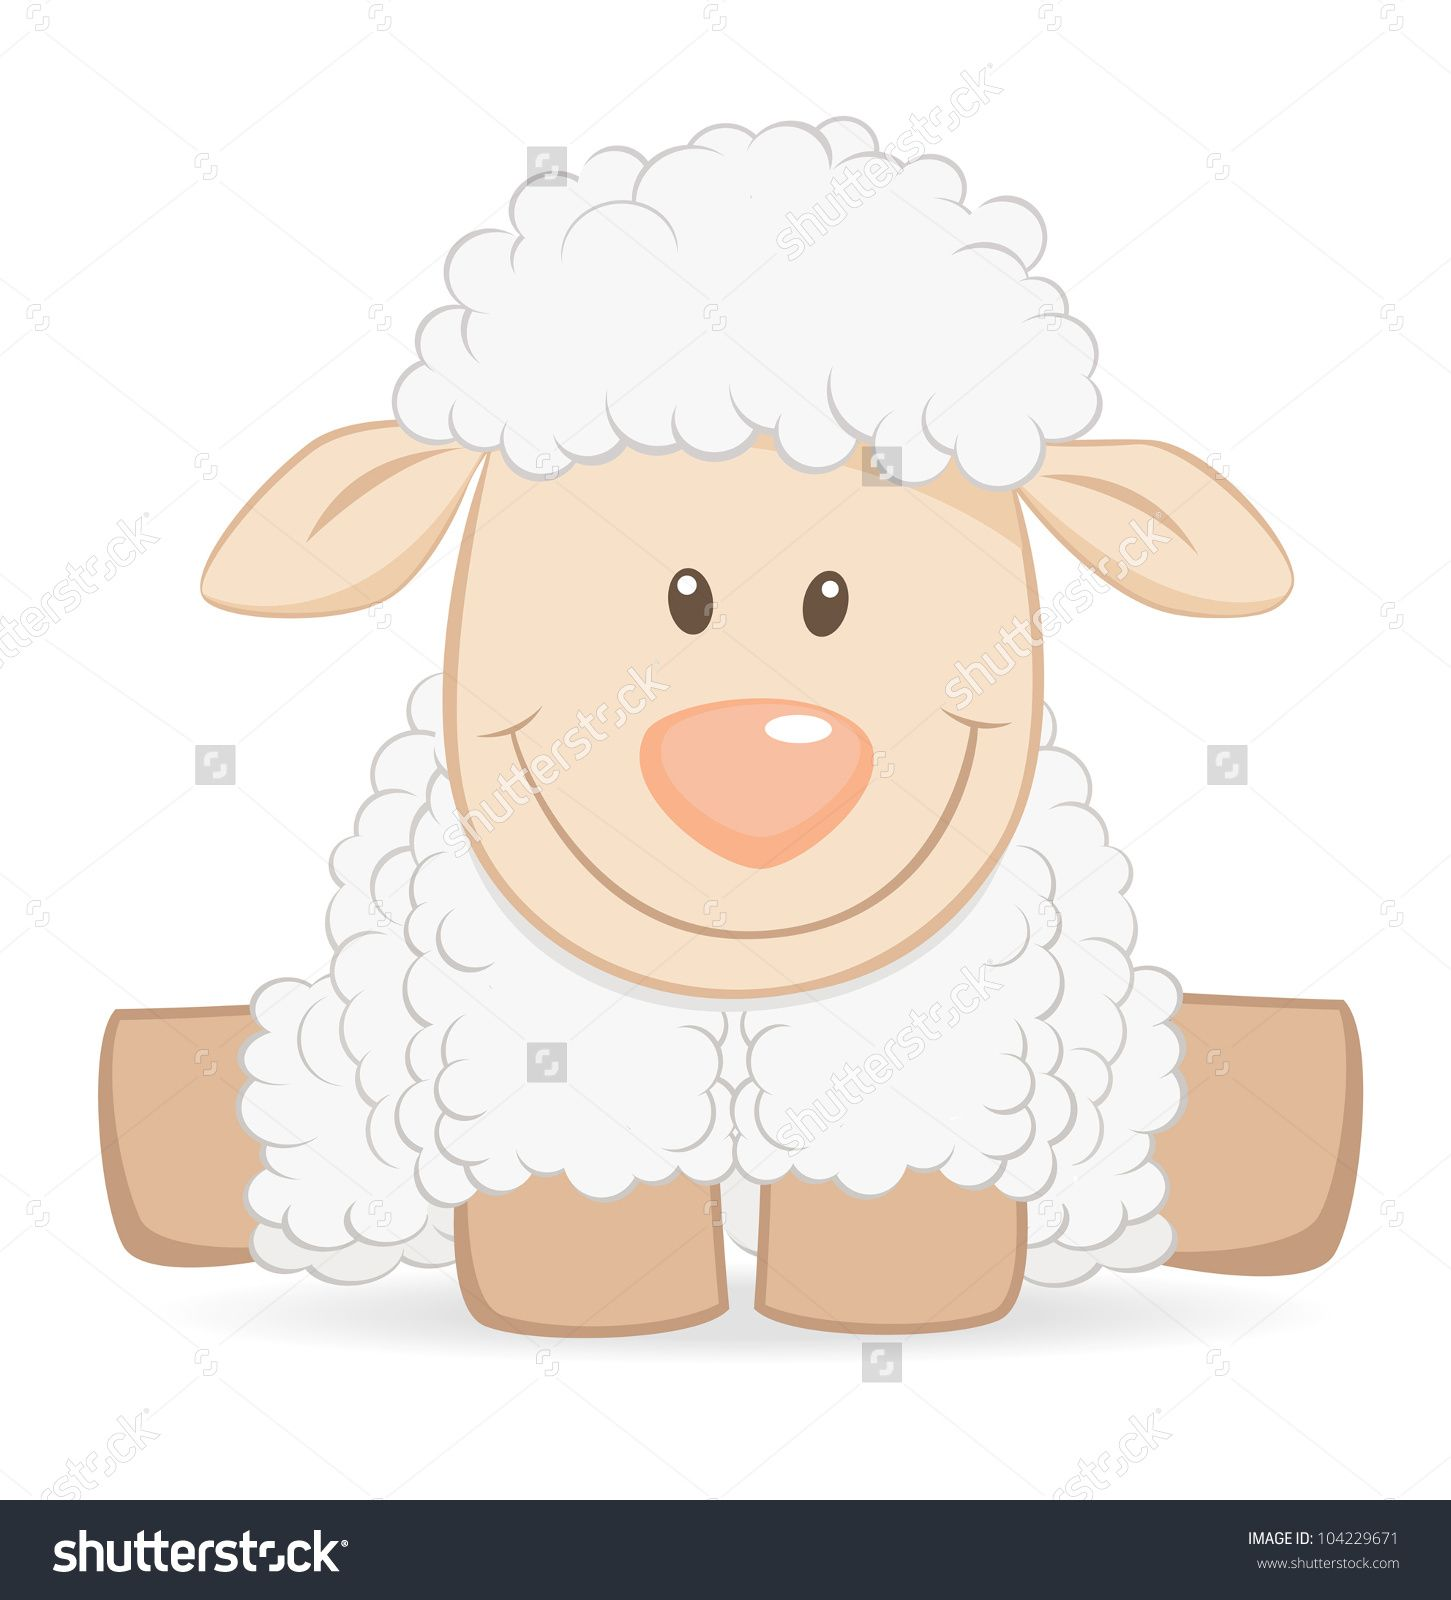 Cartoon baby sheep funny illustration | art | Pinterest | Baby ... for Baby Lamb Clipart  45gtk